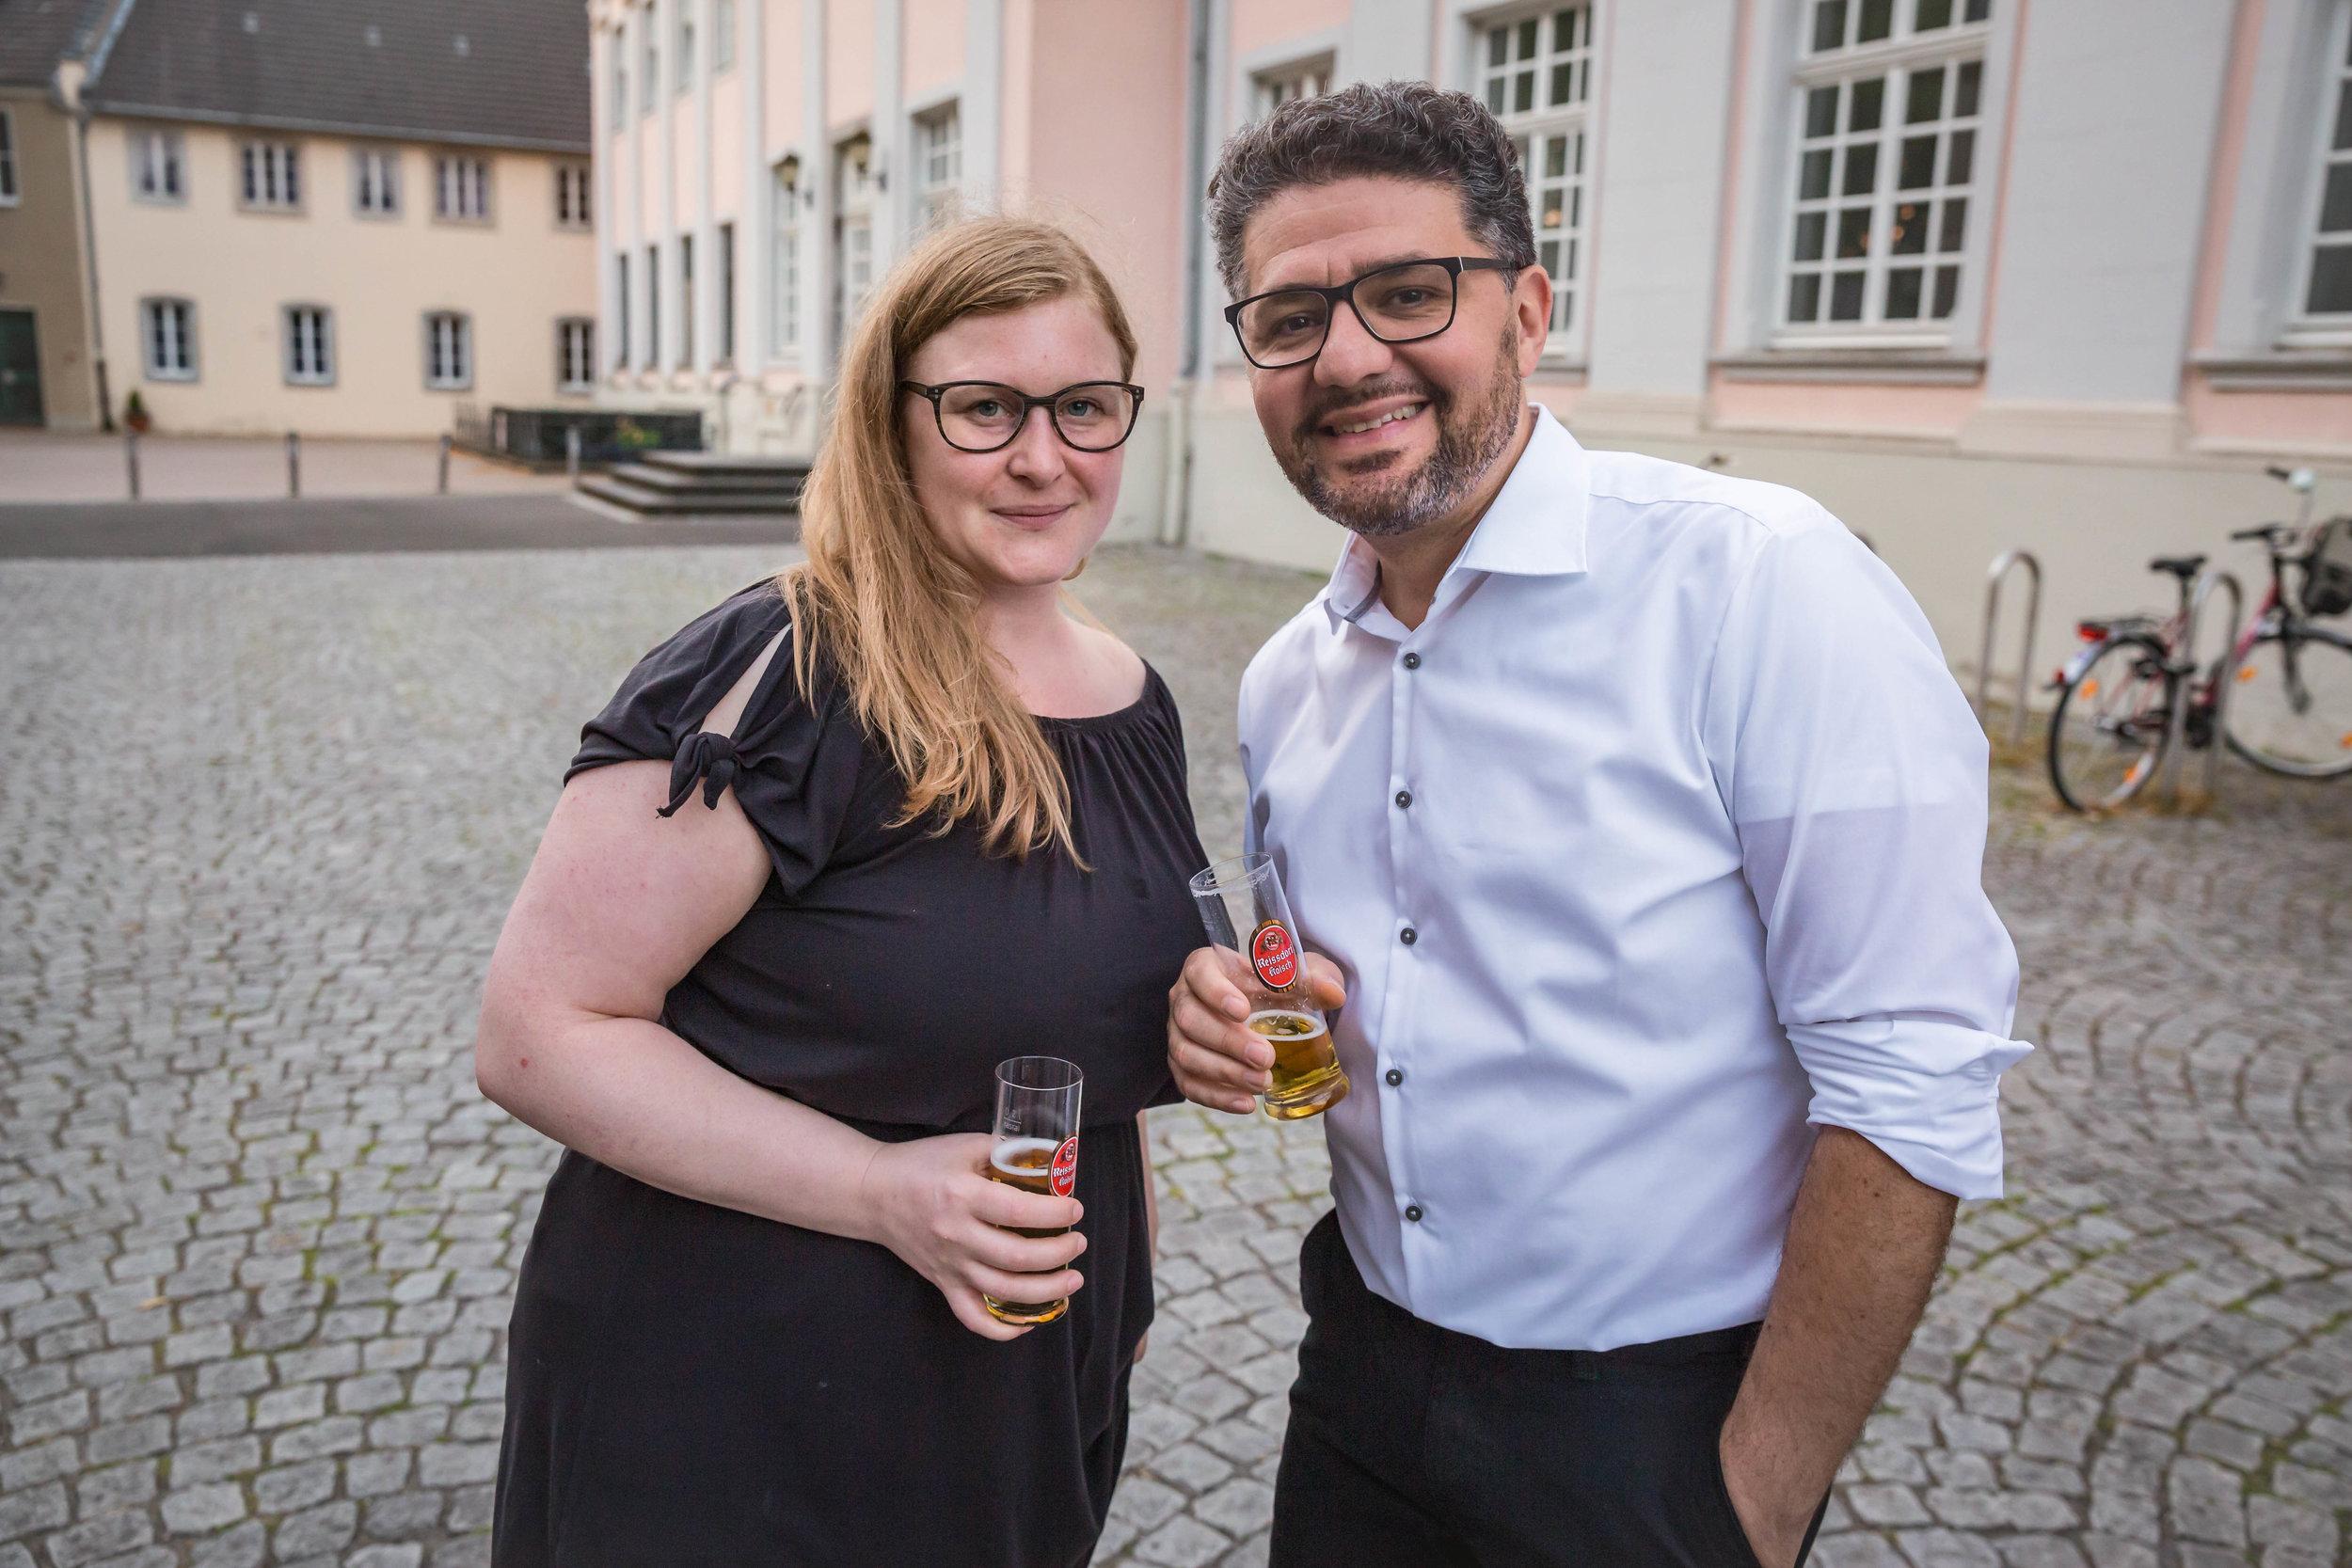 20190626_Akademie_40-jähriges_Jubiläum_FB_kl-5312056.jpg